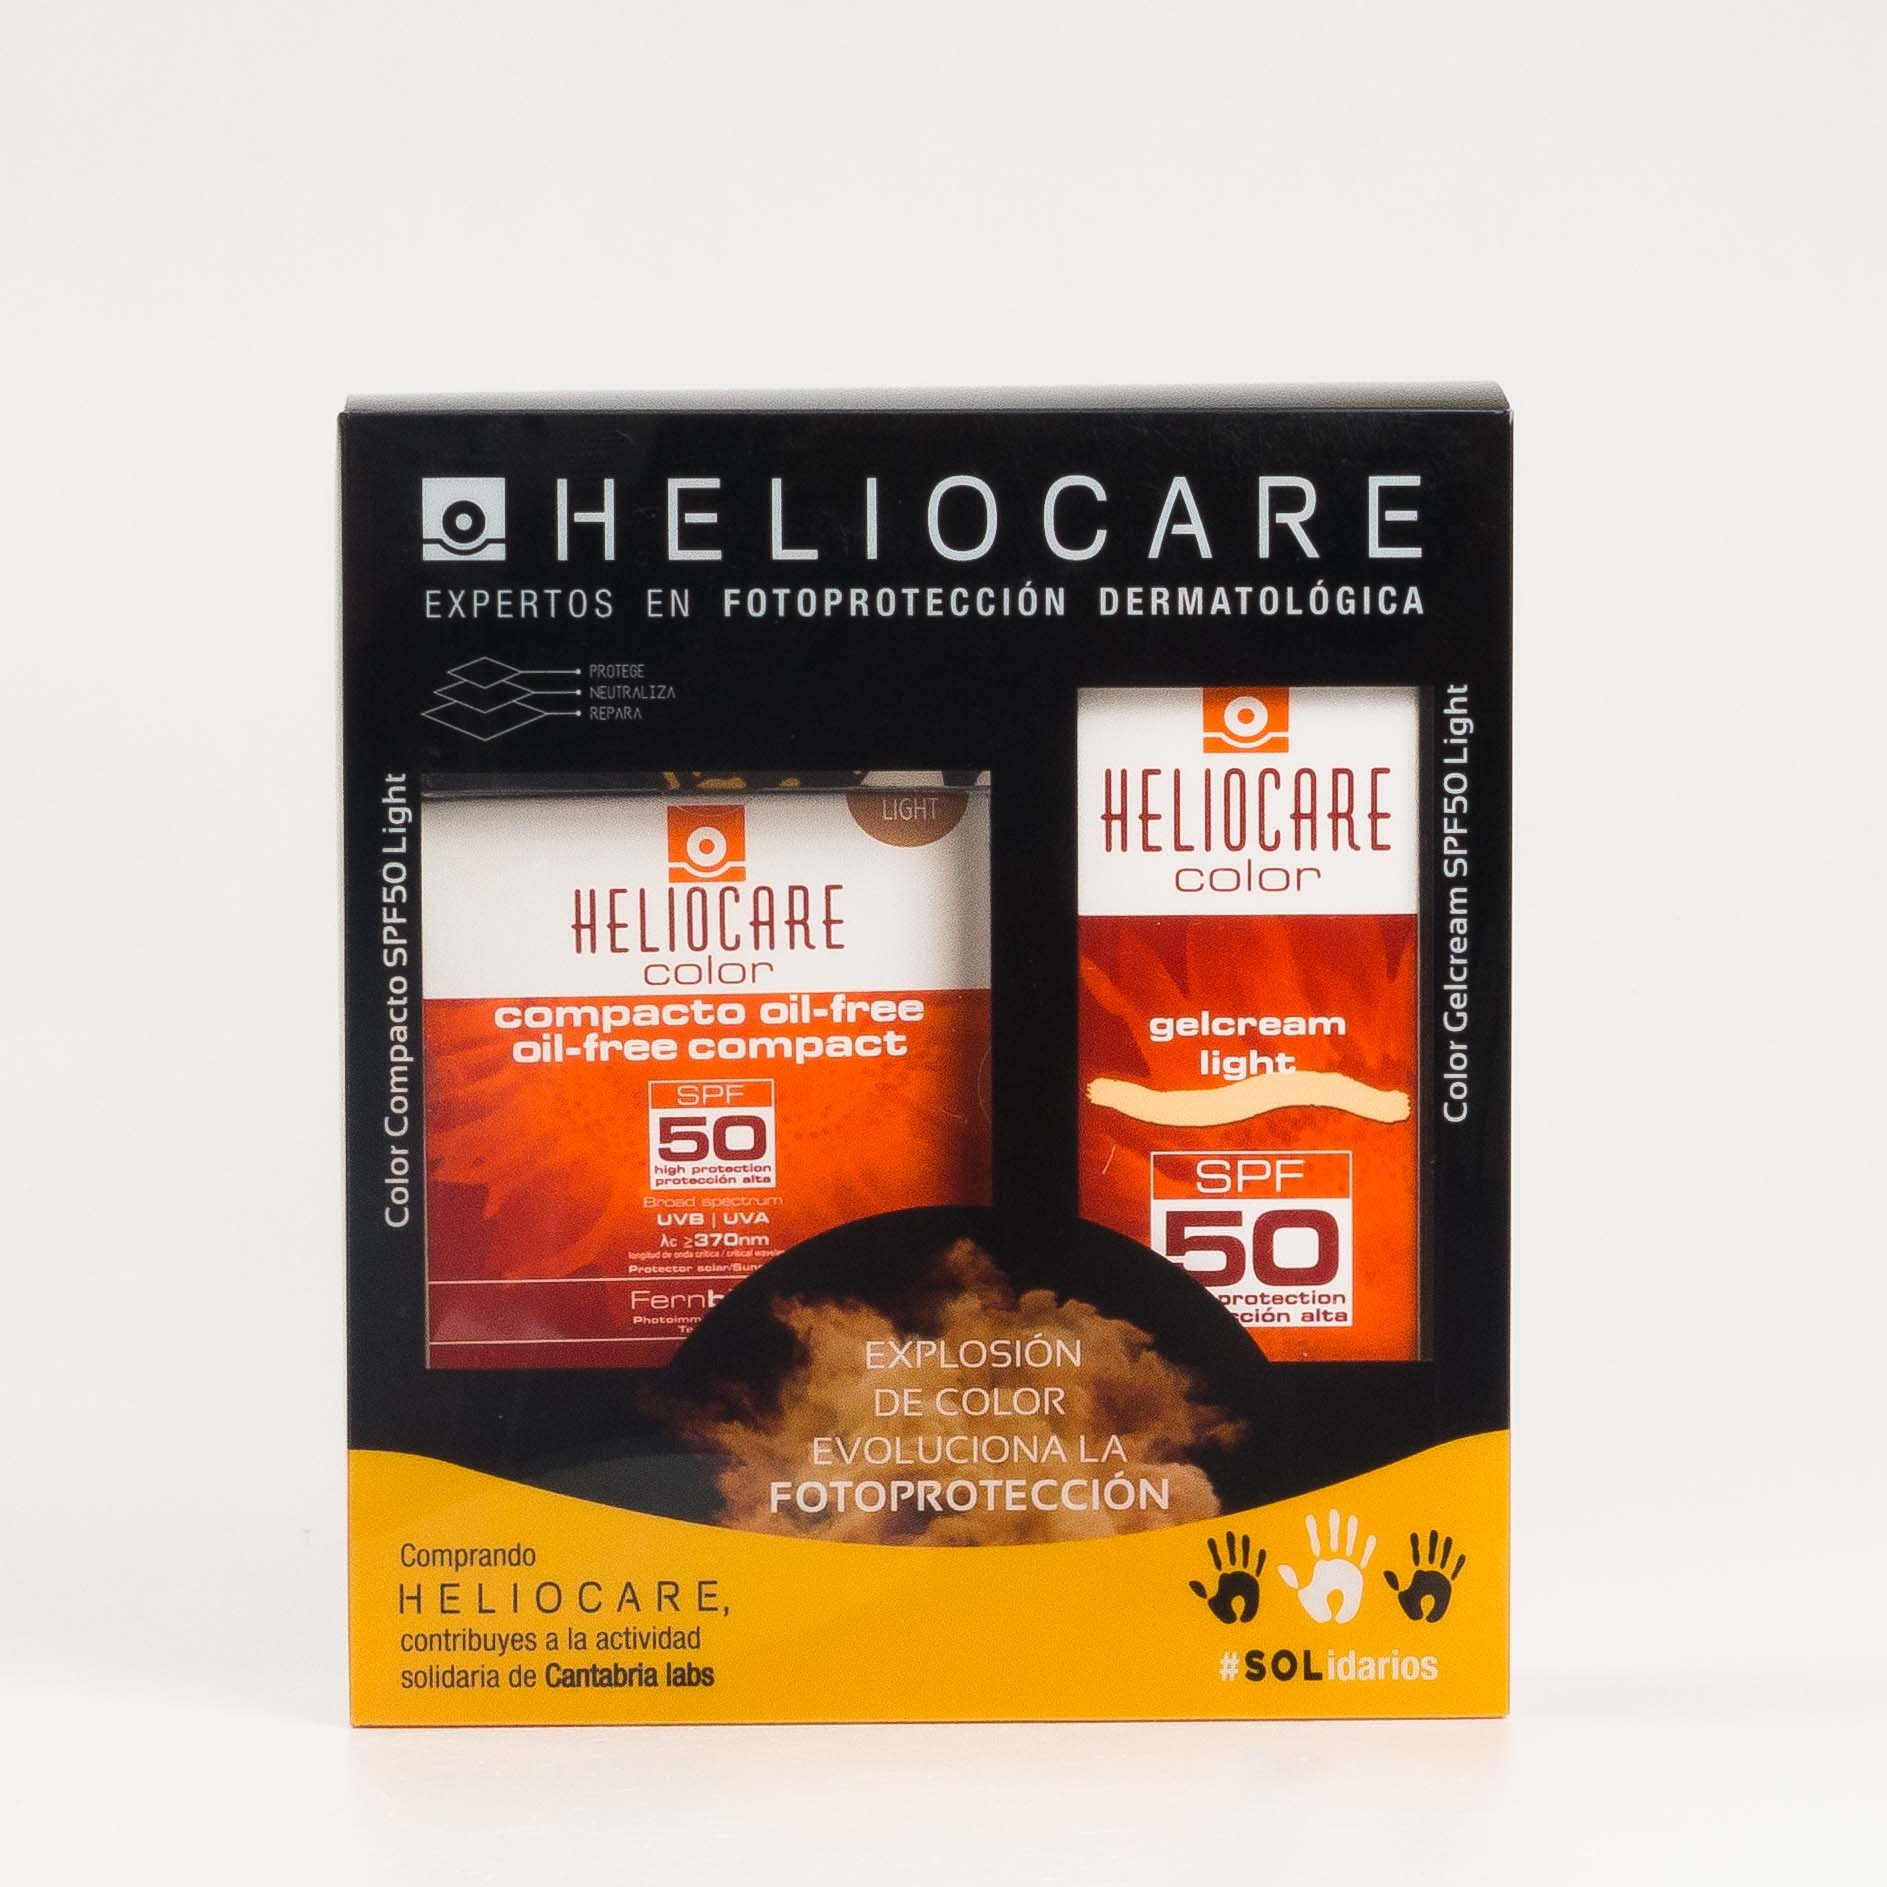 Pack Oferta Heliocare Gel-crema Light + Heliocare Compact Oilfree Light